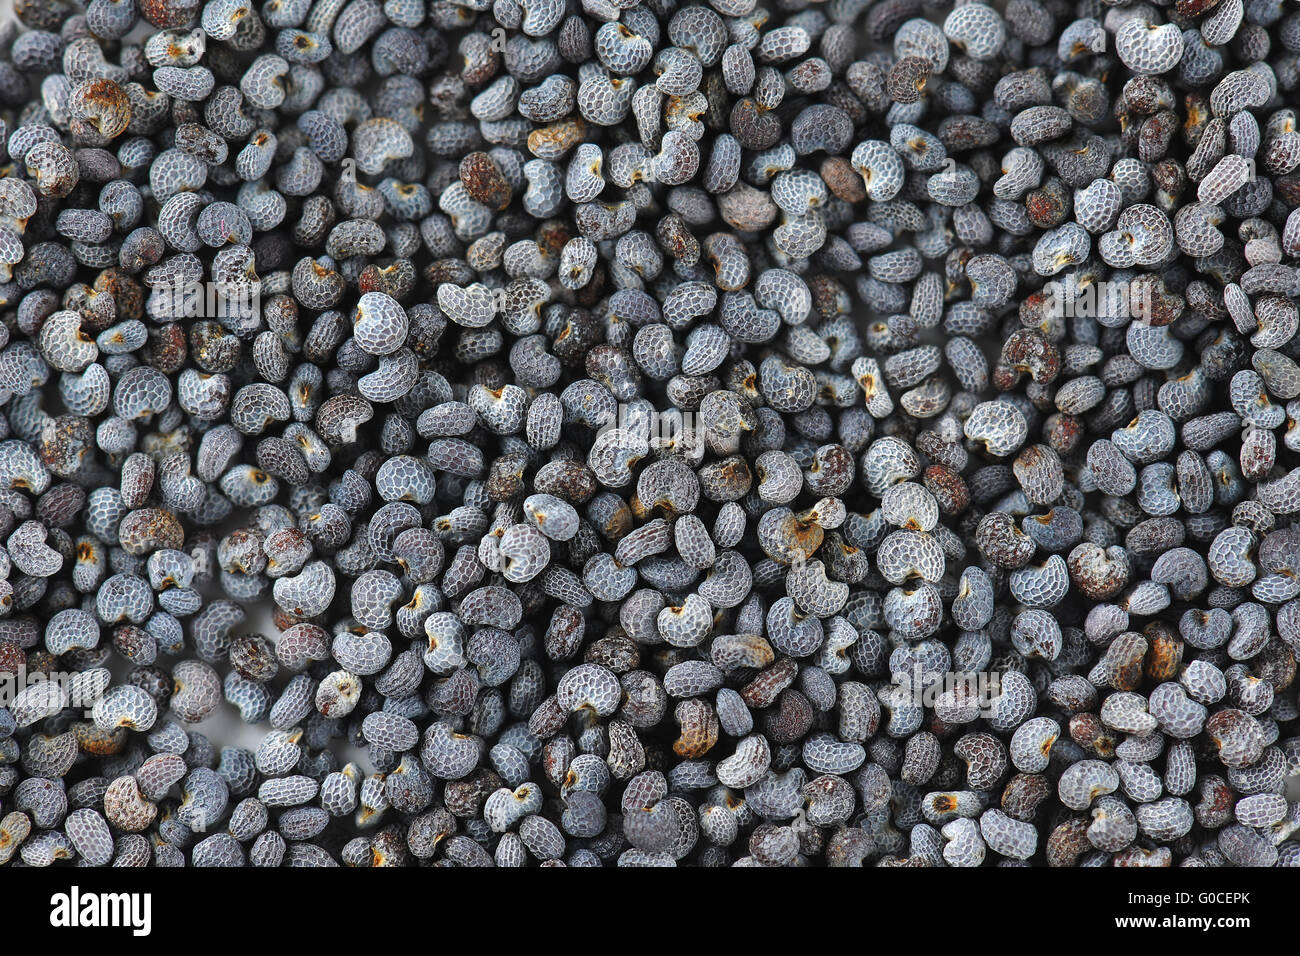 Detalle de las semillas de amapola - full frame Imagen De Stock